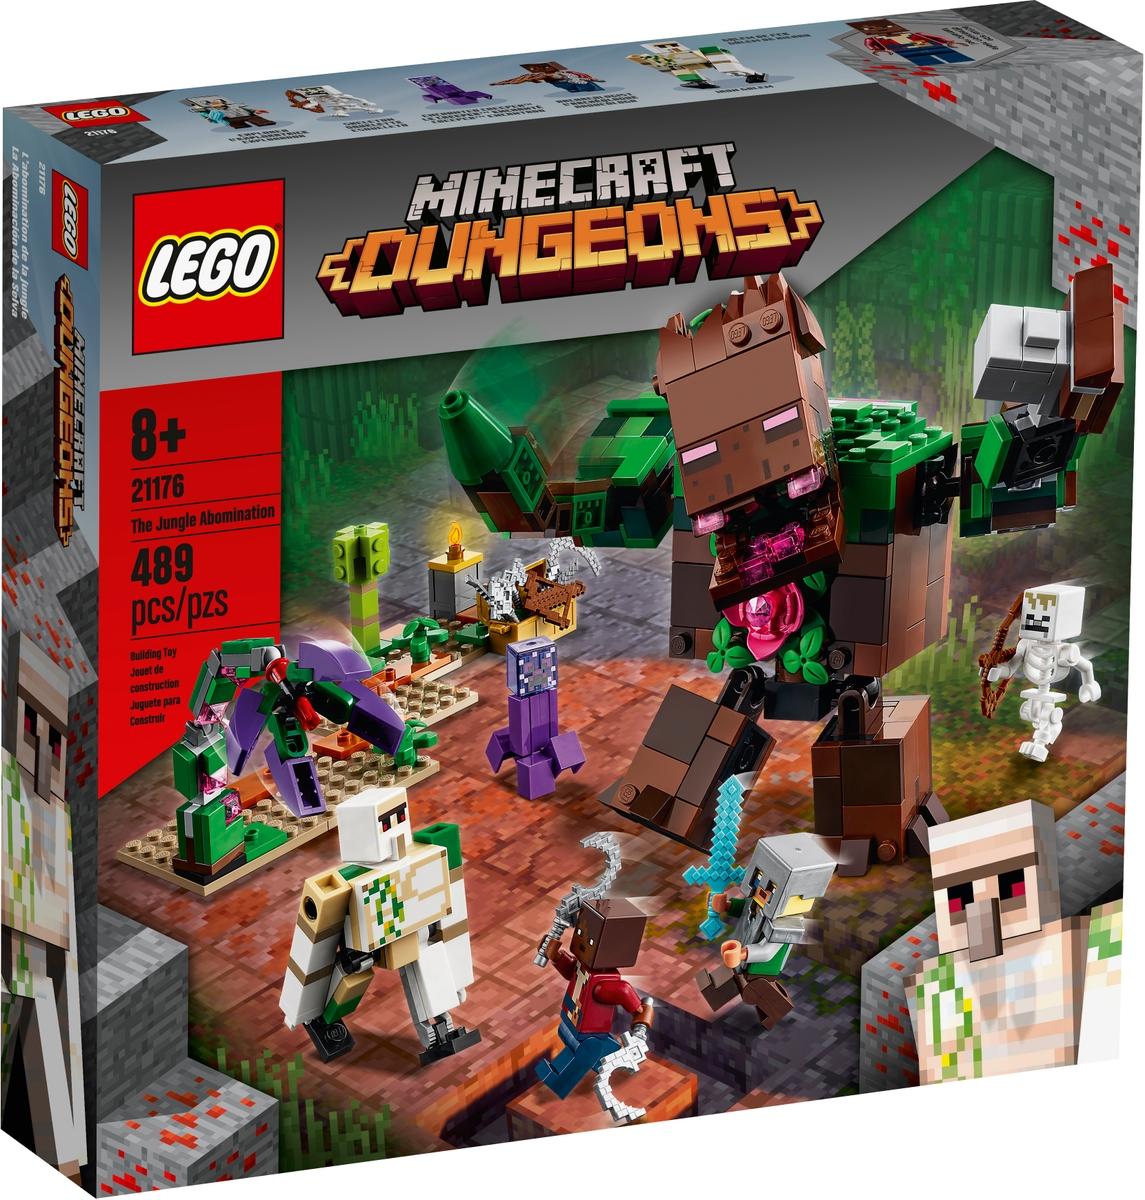 lego 21176 the jungle abomination